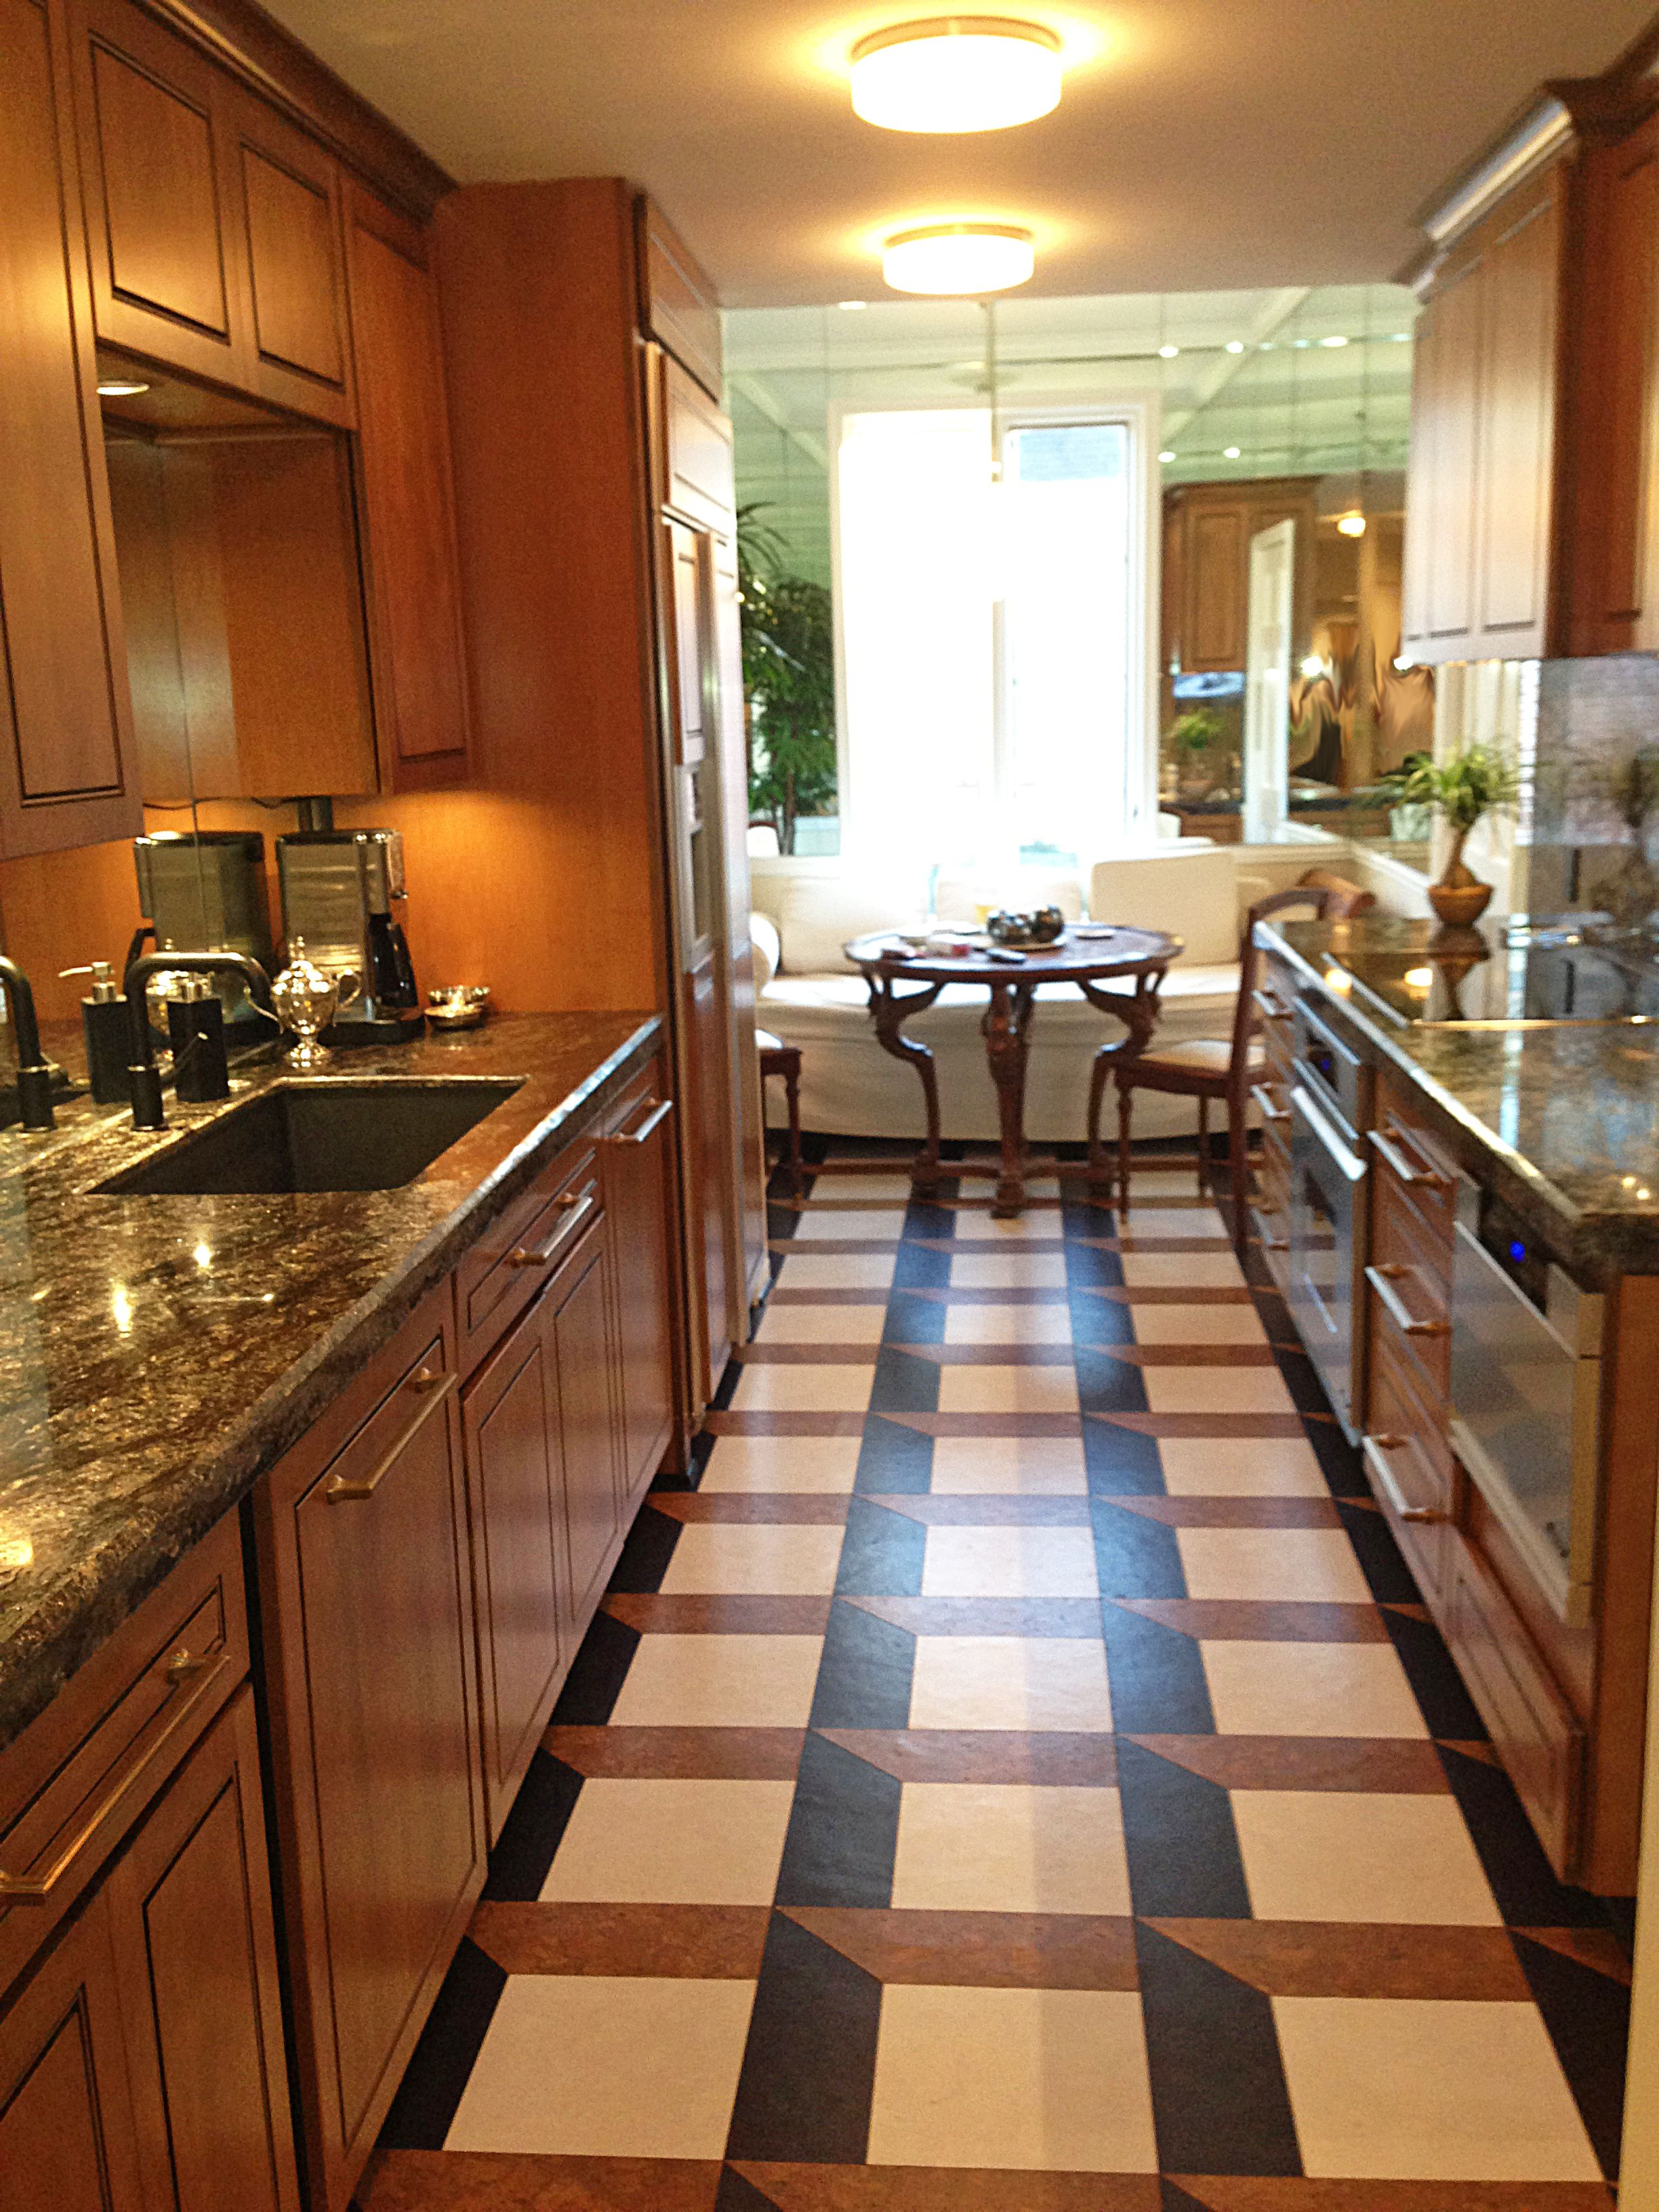 Striking Kitchen Cork Floor From Globus Cork 100 Cork Tiles In